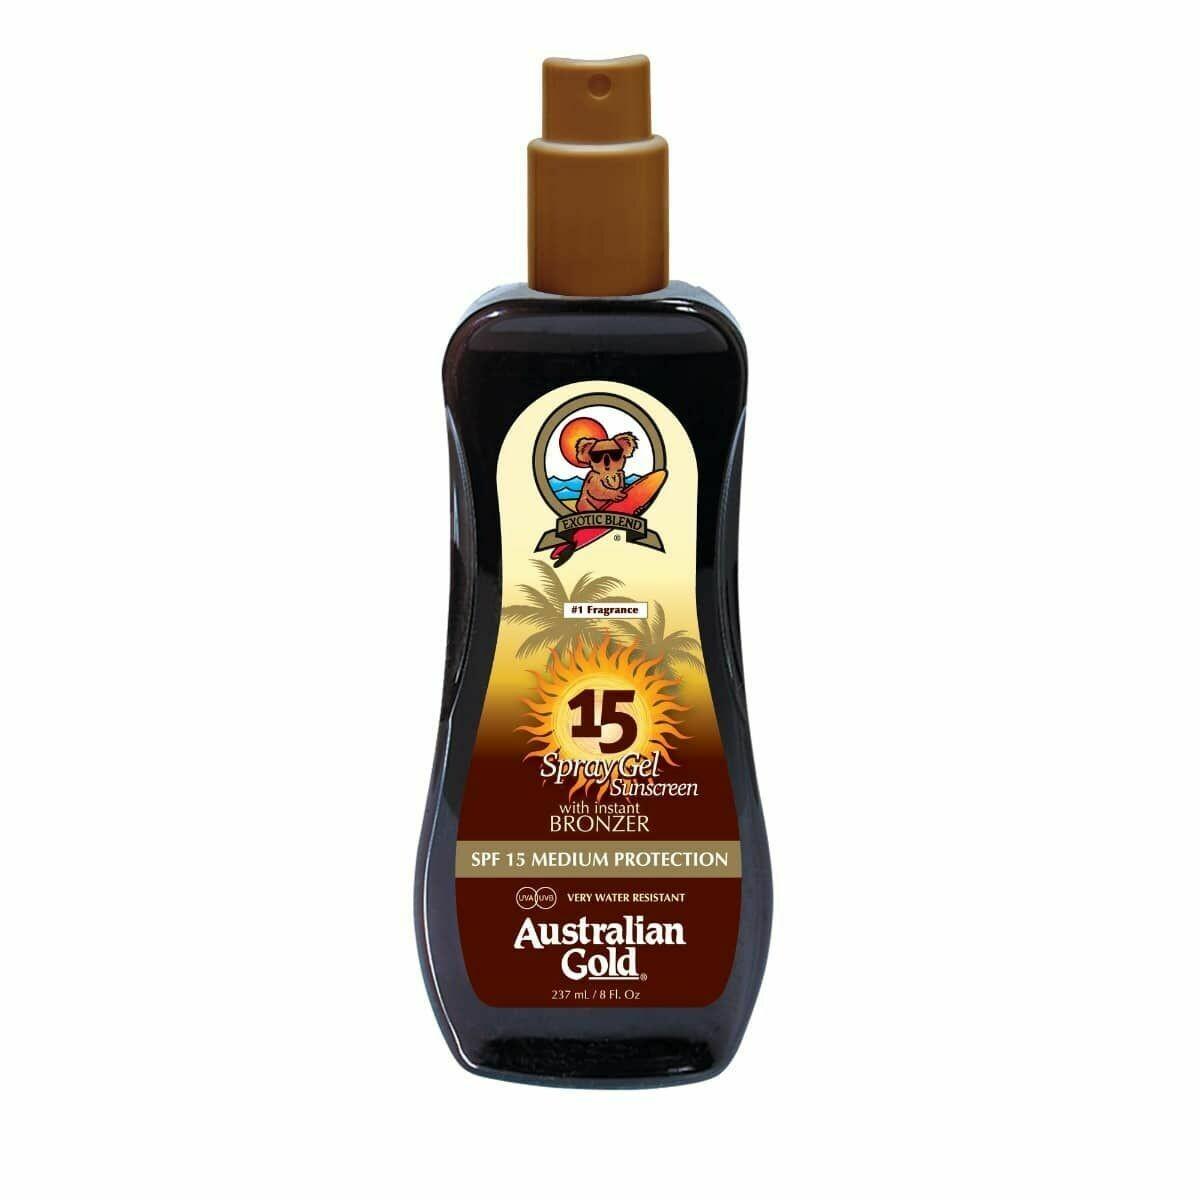 AUSTRALIAN GOLD Spf 15 Spray Gel with Bronzer 237ml - Cocoa Dreams